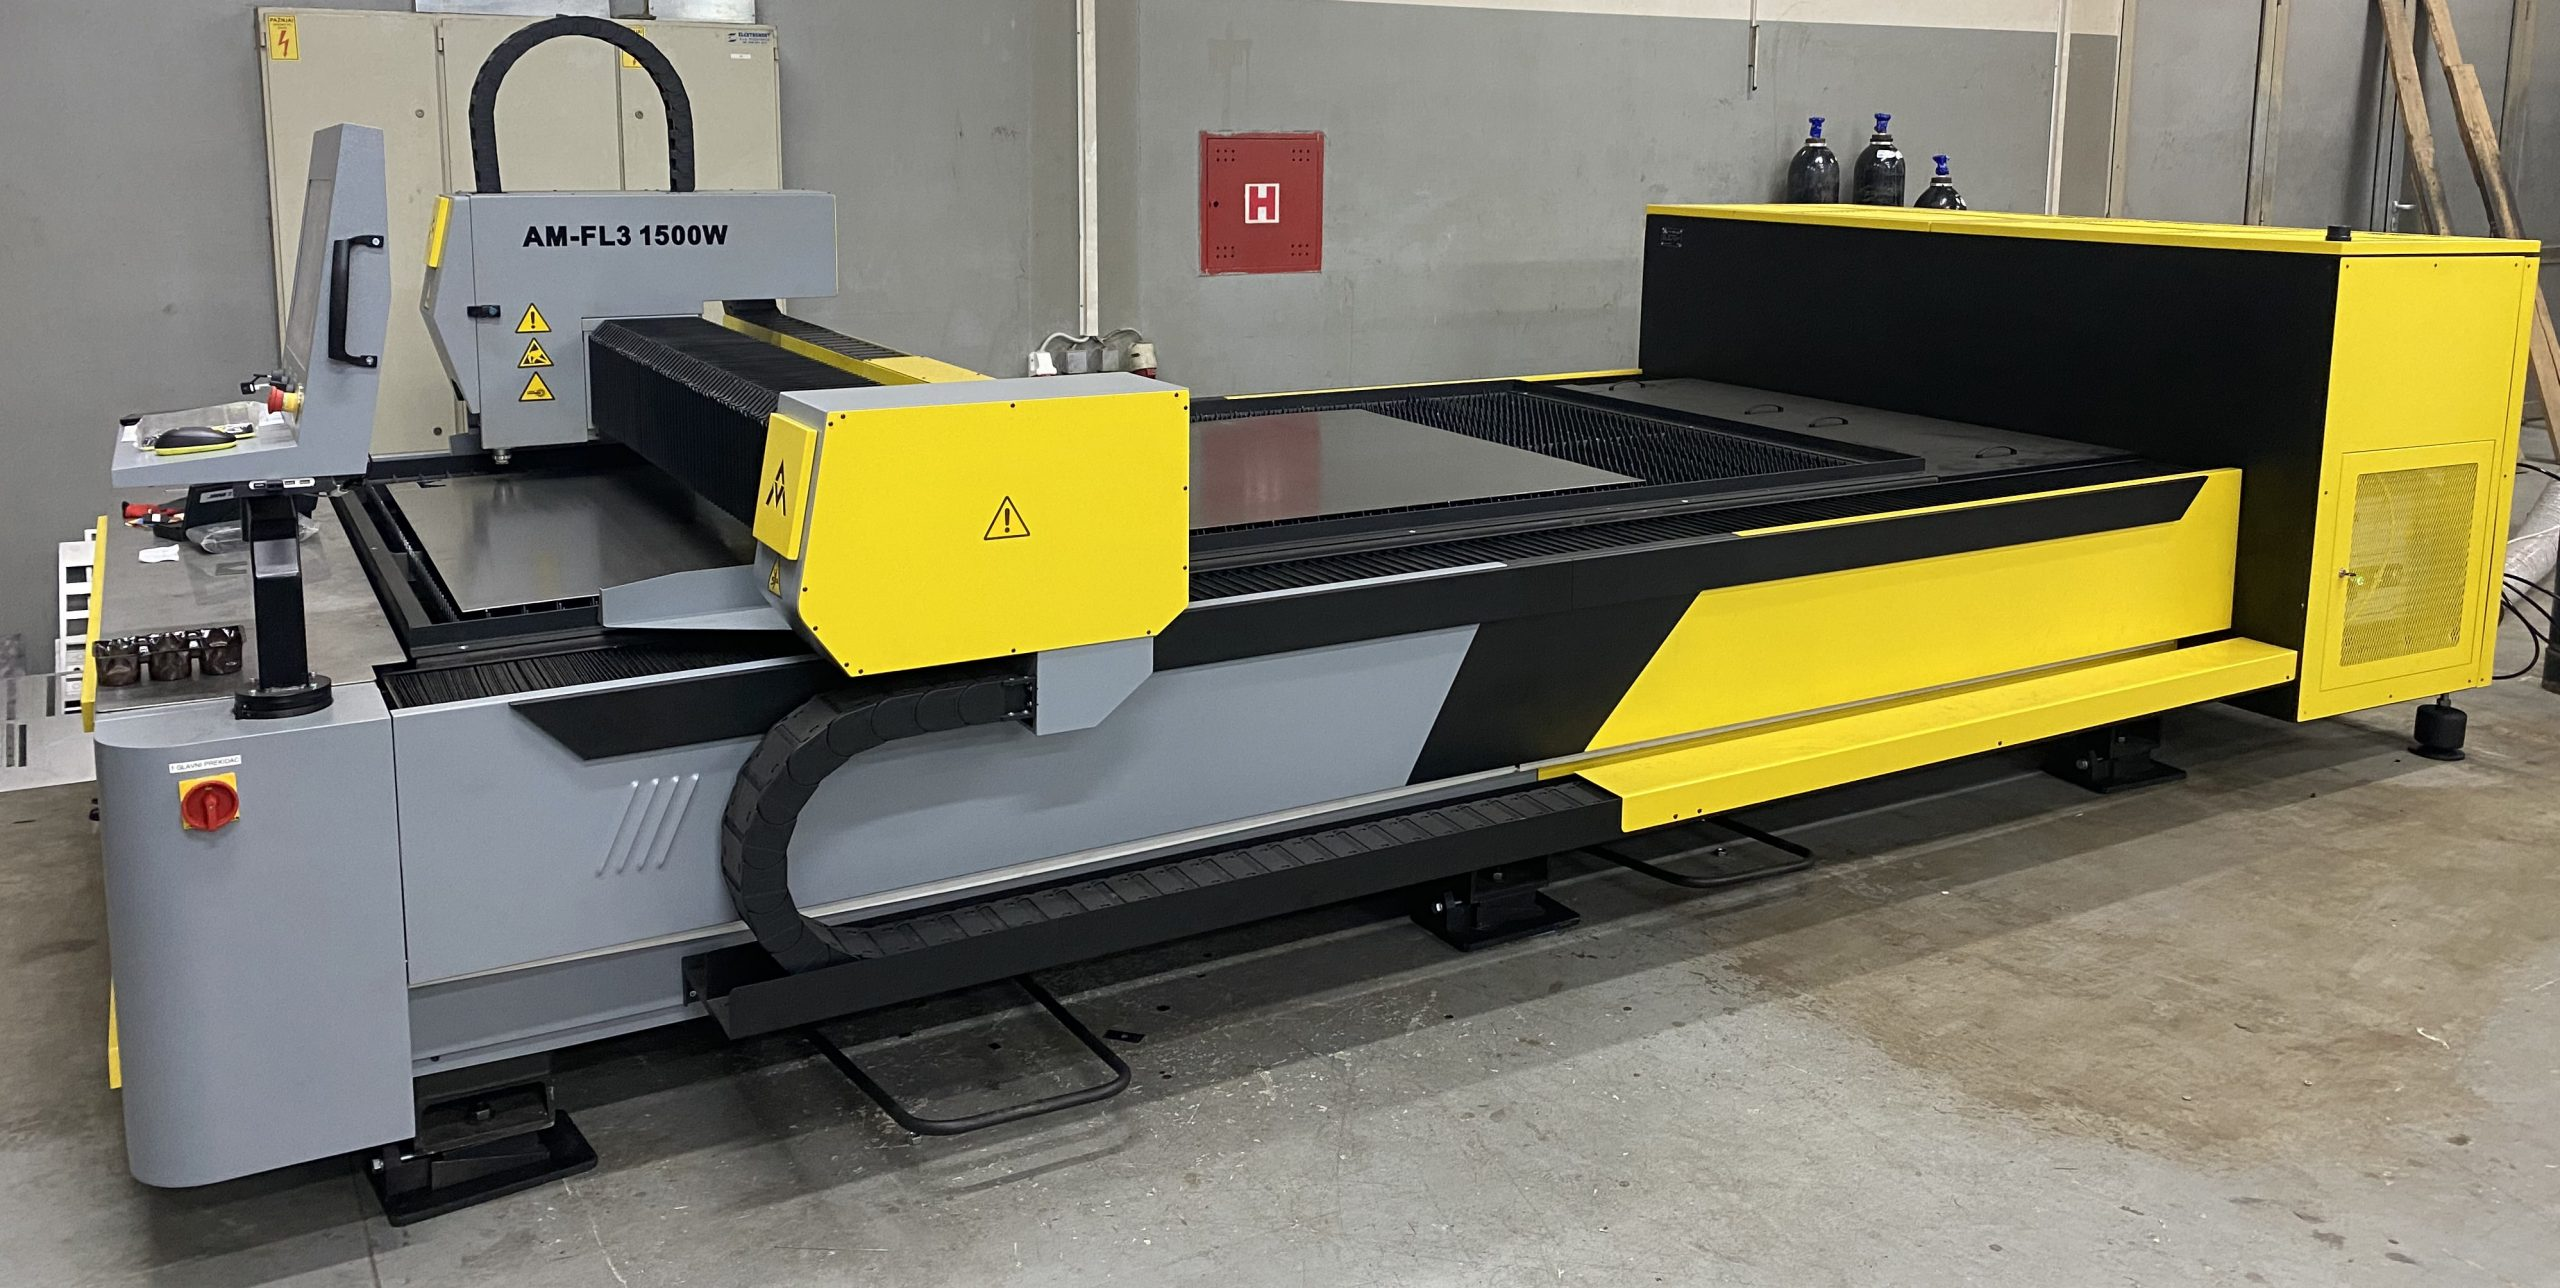 CNC Fiber Laser, AM-FL 1500W, AMTOOLS, MADE IN SERBIA